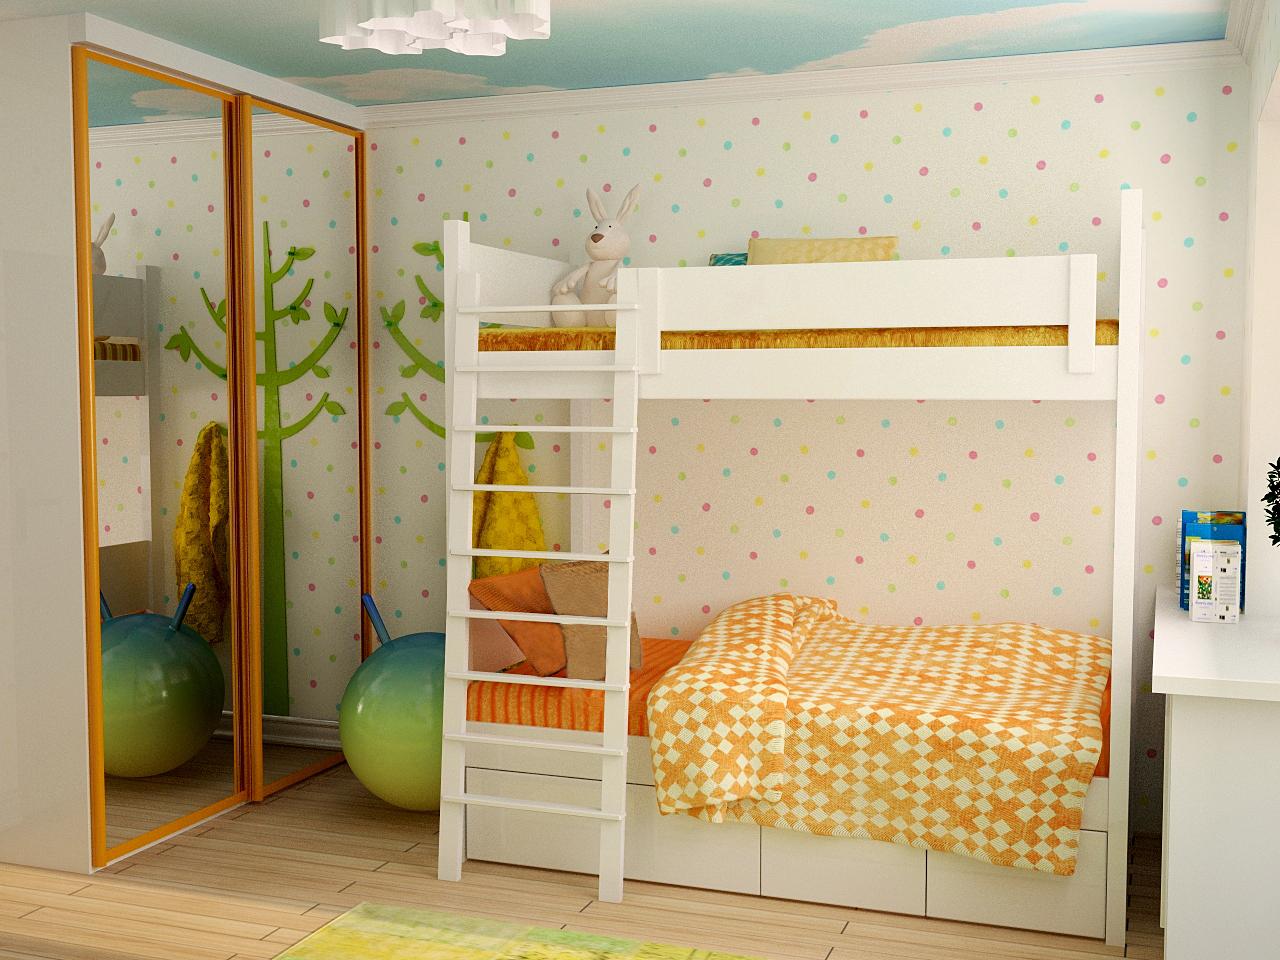 Детская в стиле классический - фото и дизайн на vivbo.ru.